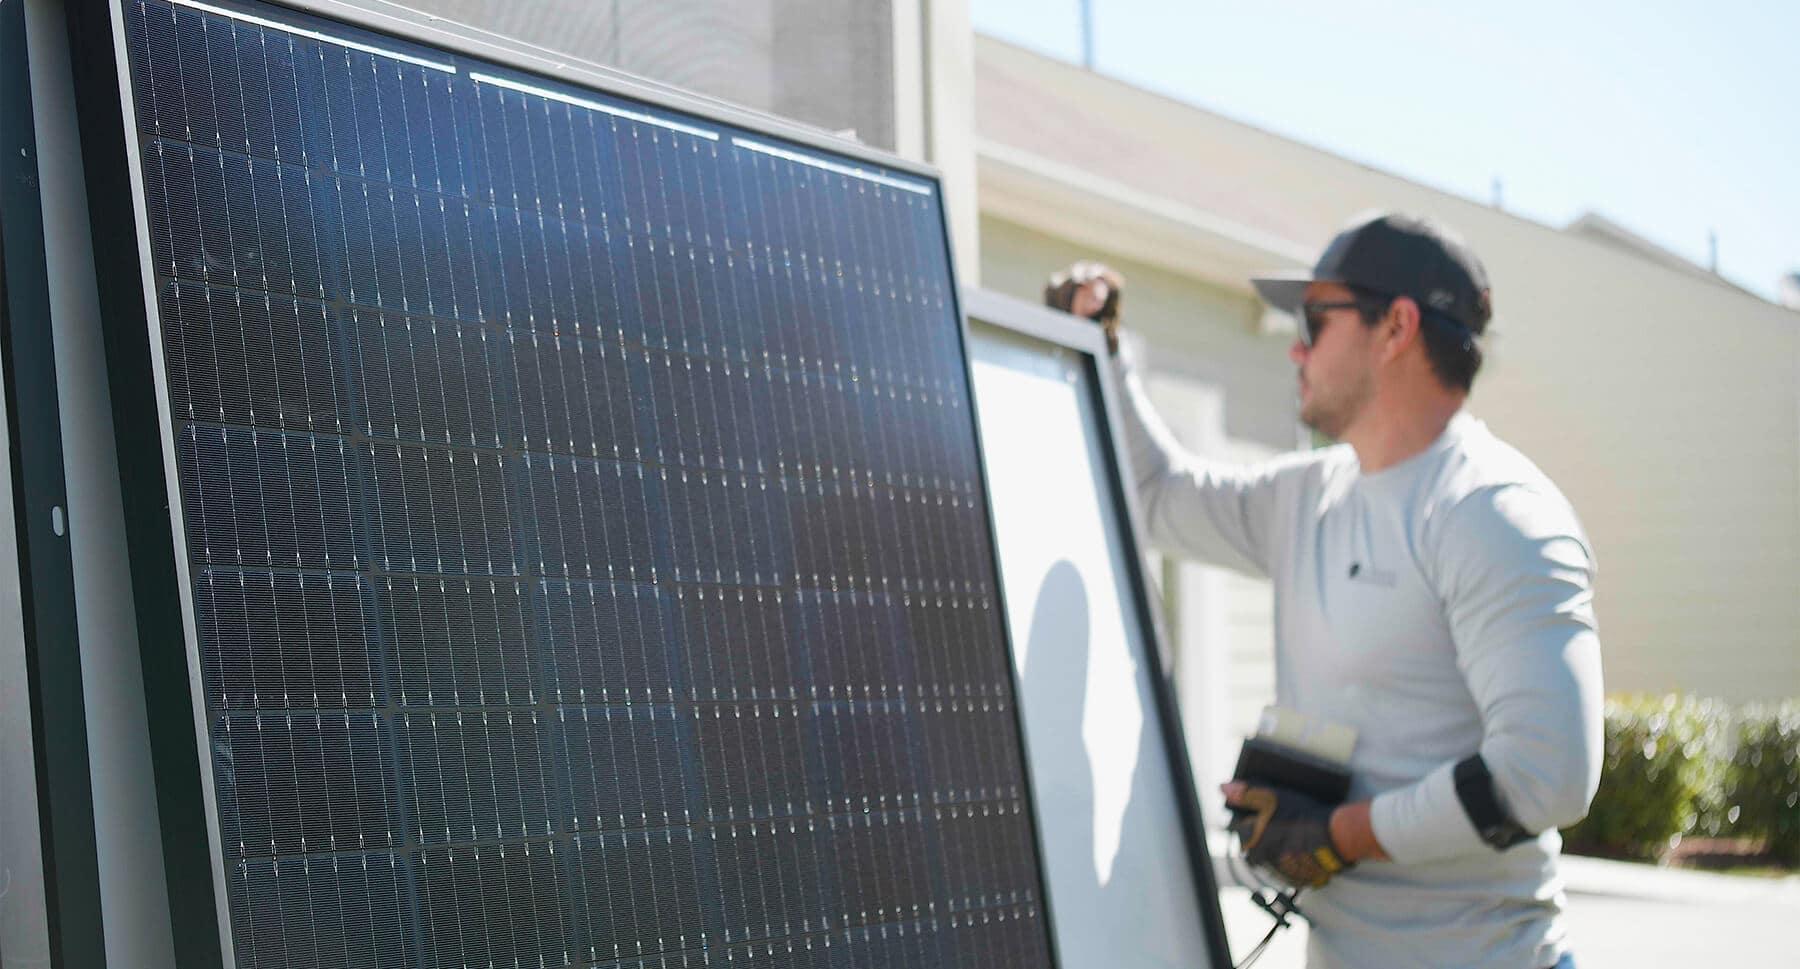 Solar Installer Inspecting Panels